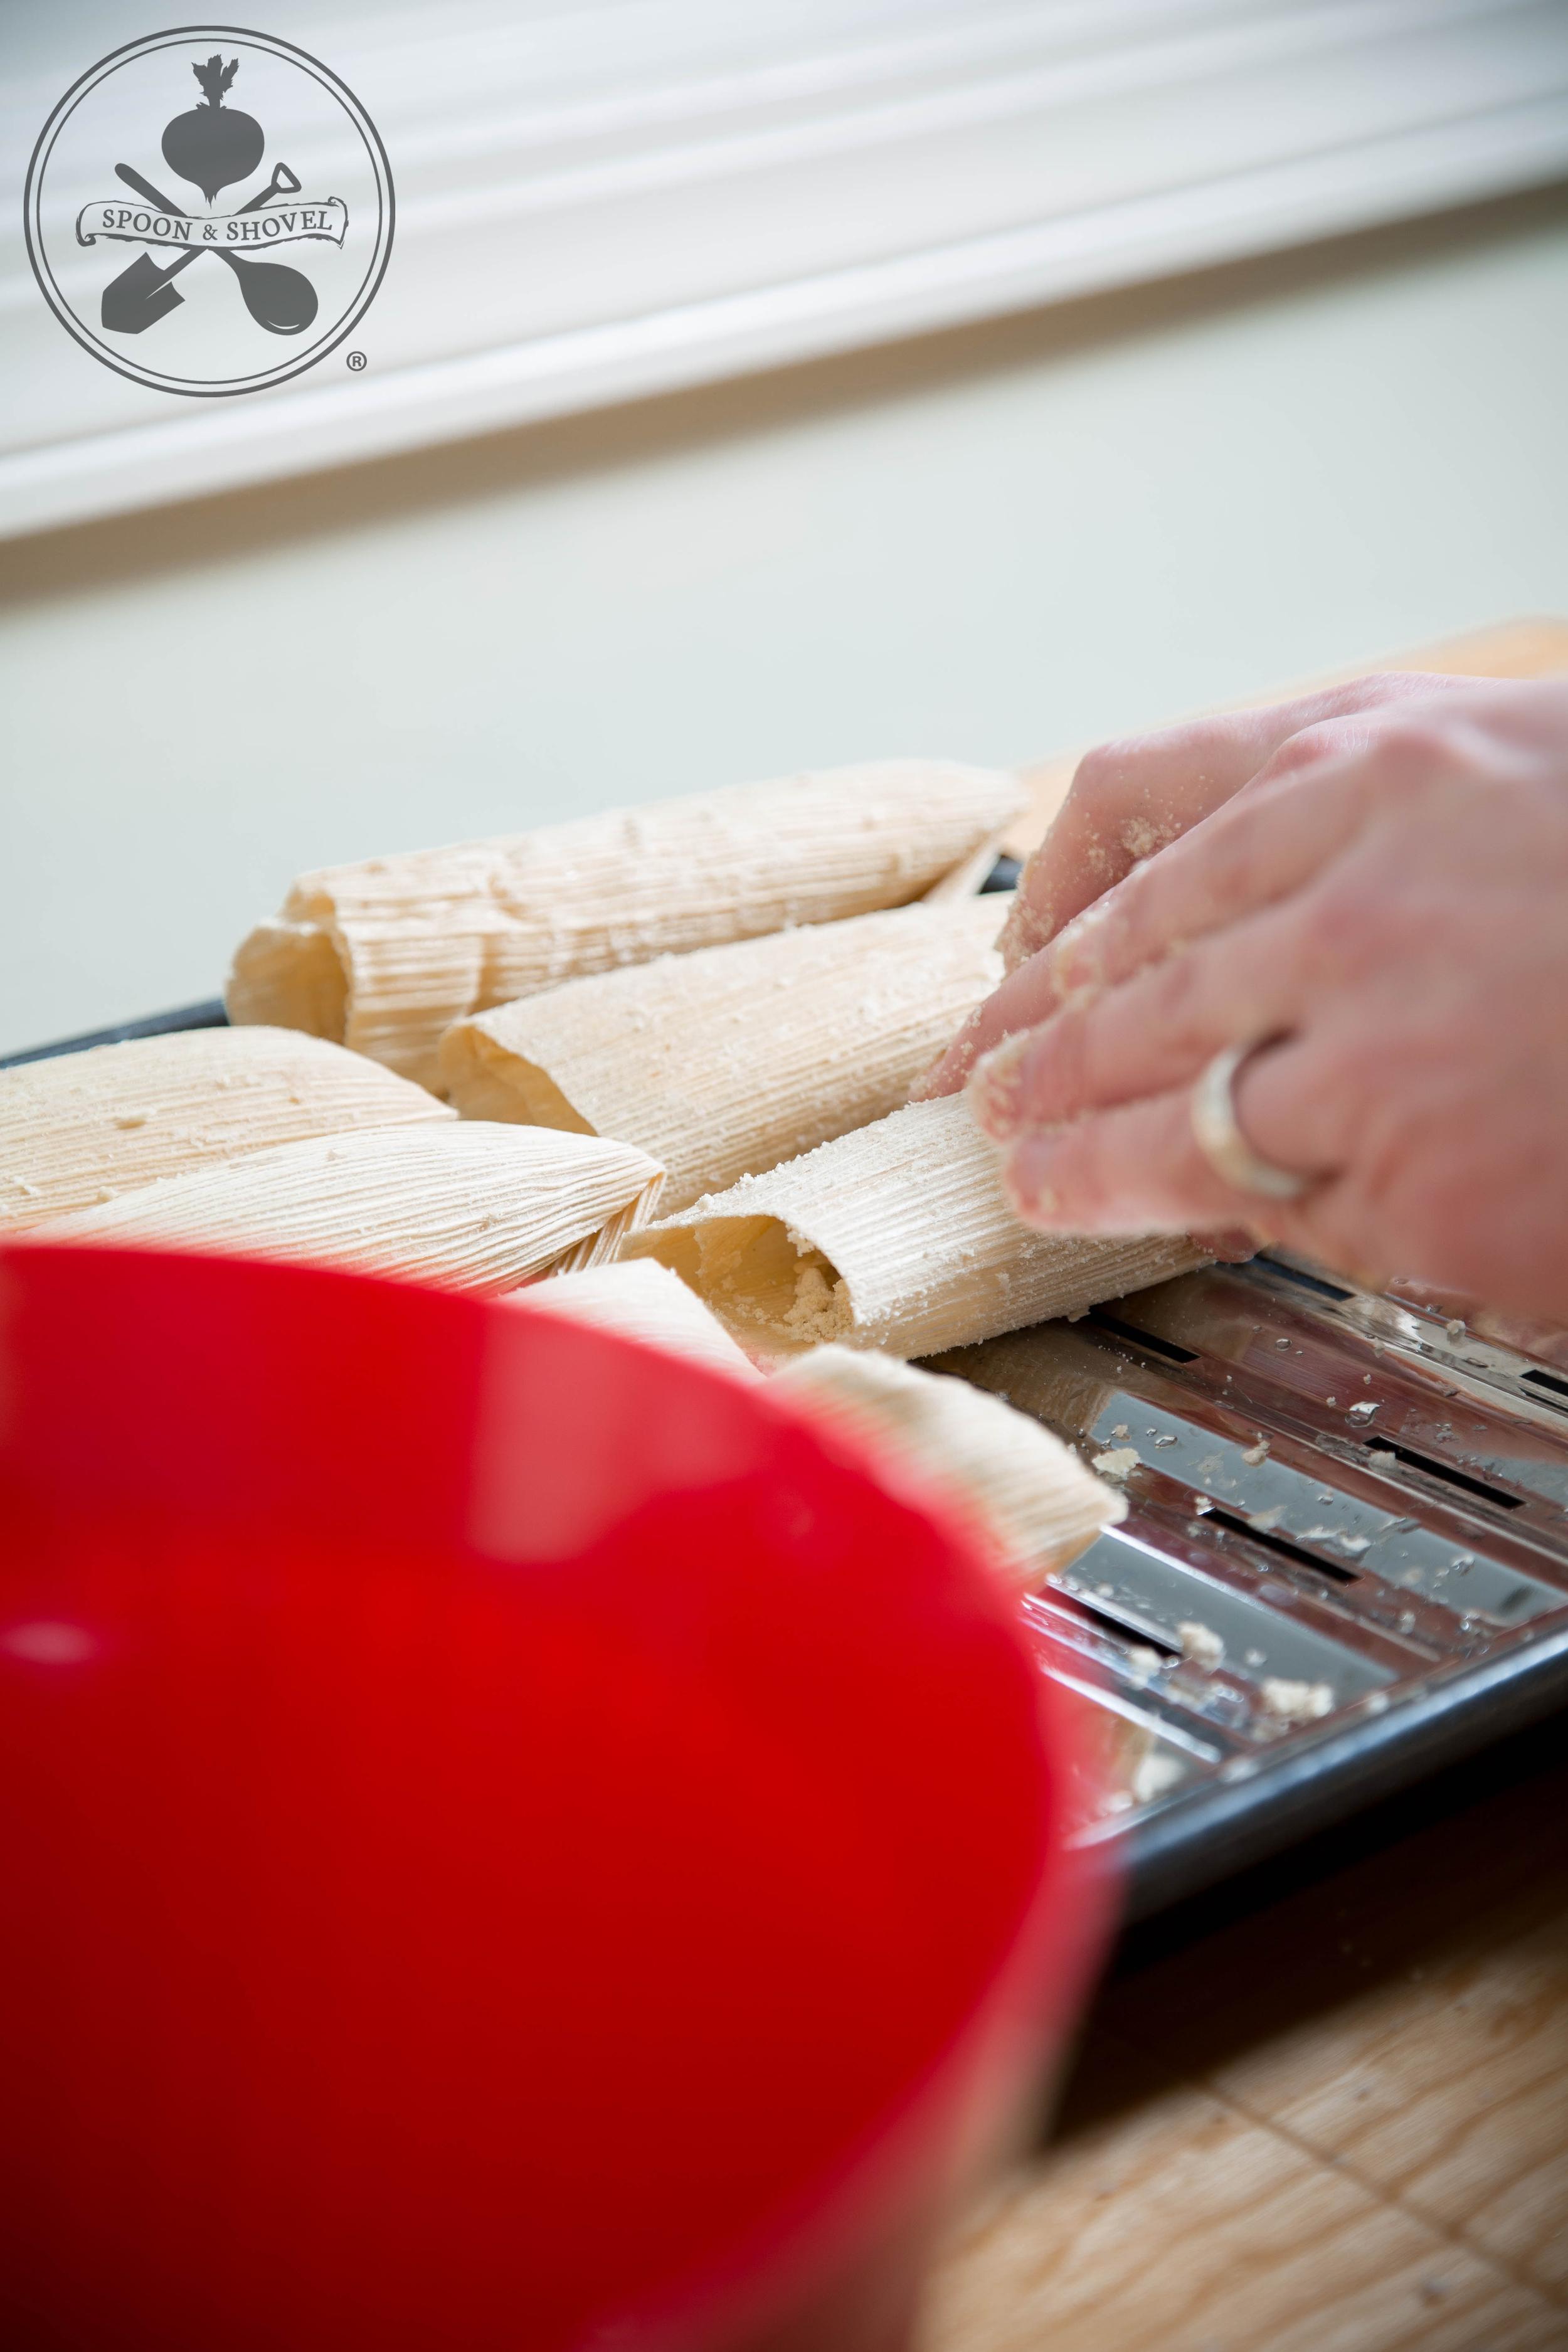 Vegan, GF jackfruit tamales  from The Spoon + Shovel